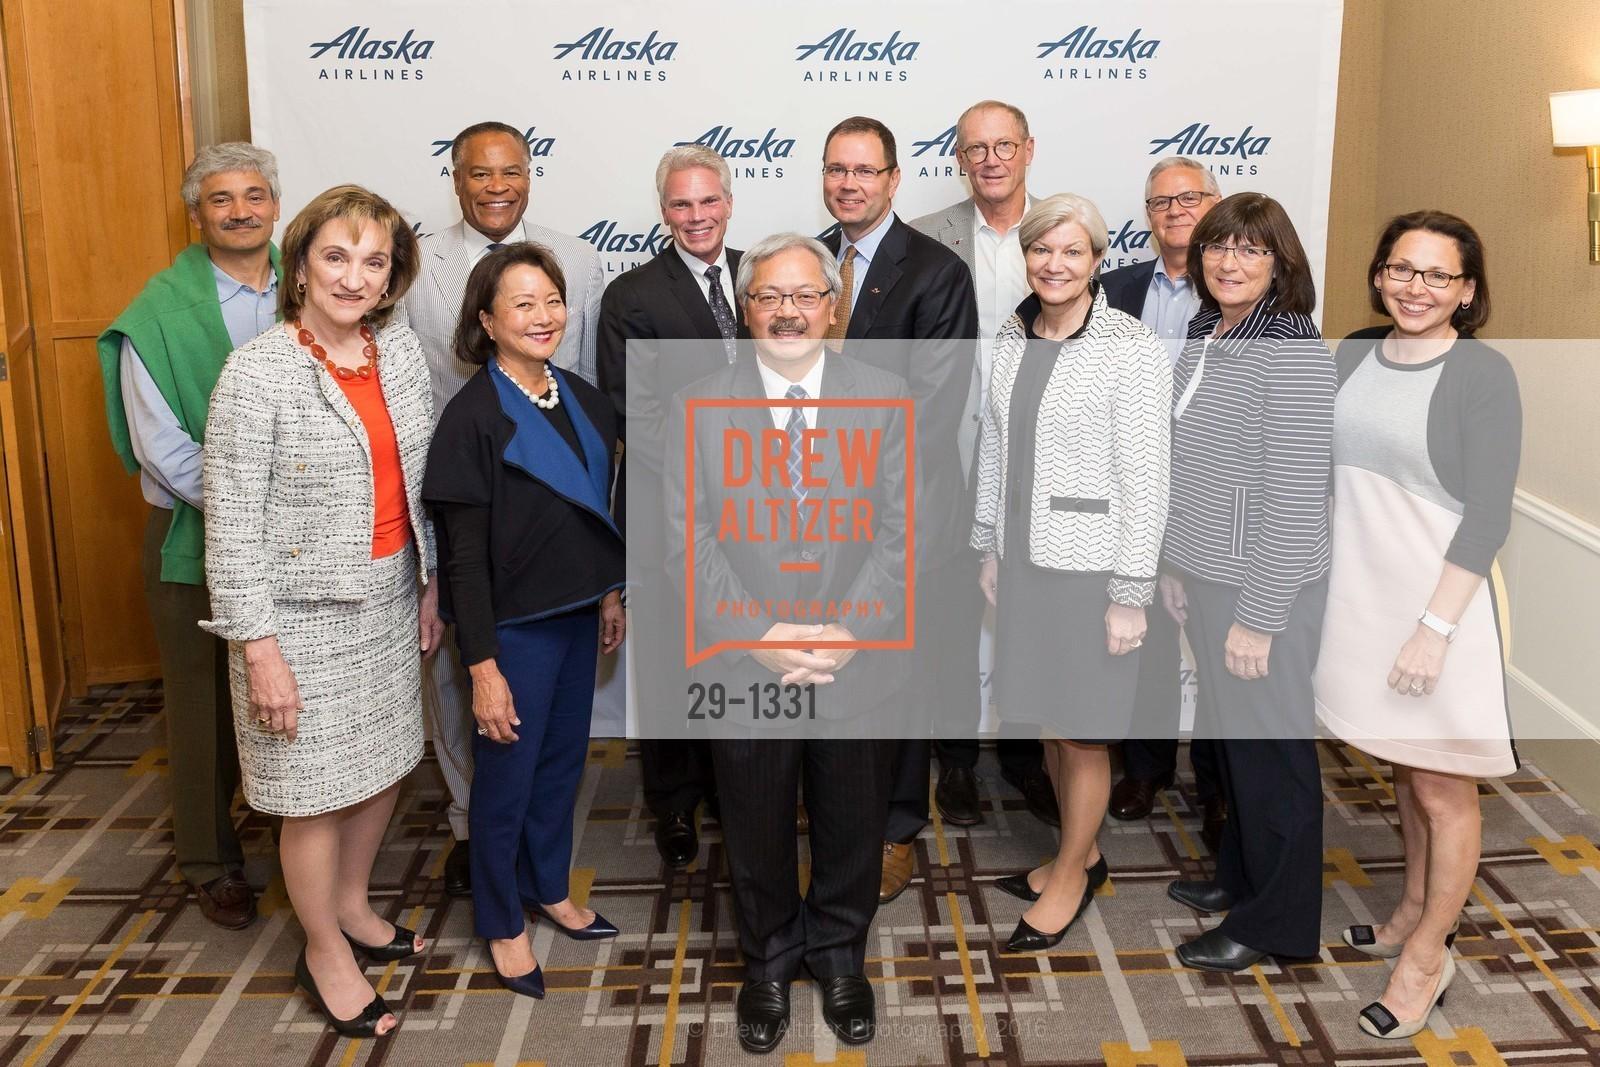 Alaska Airlines Board of Directors, Ed Lee, Photo #29-1331